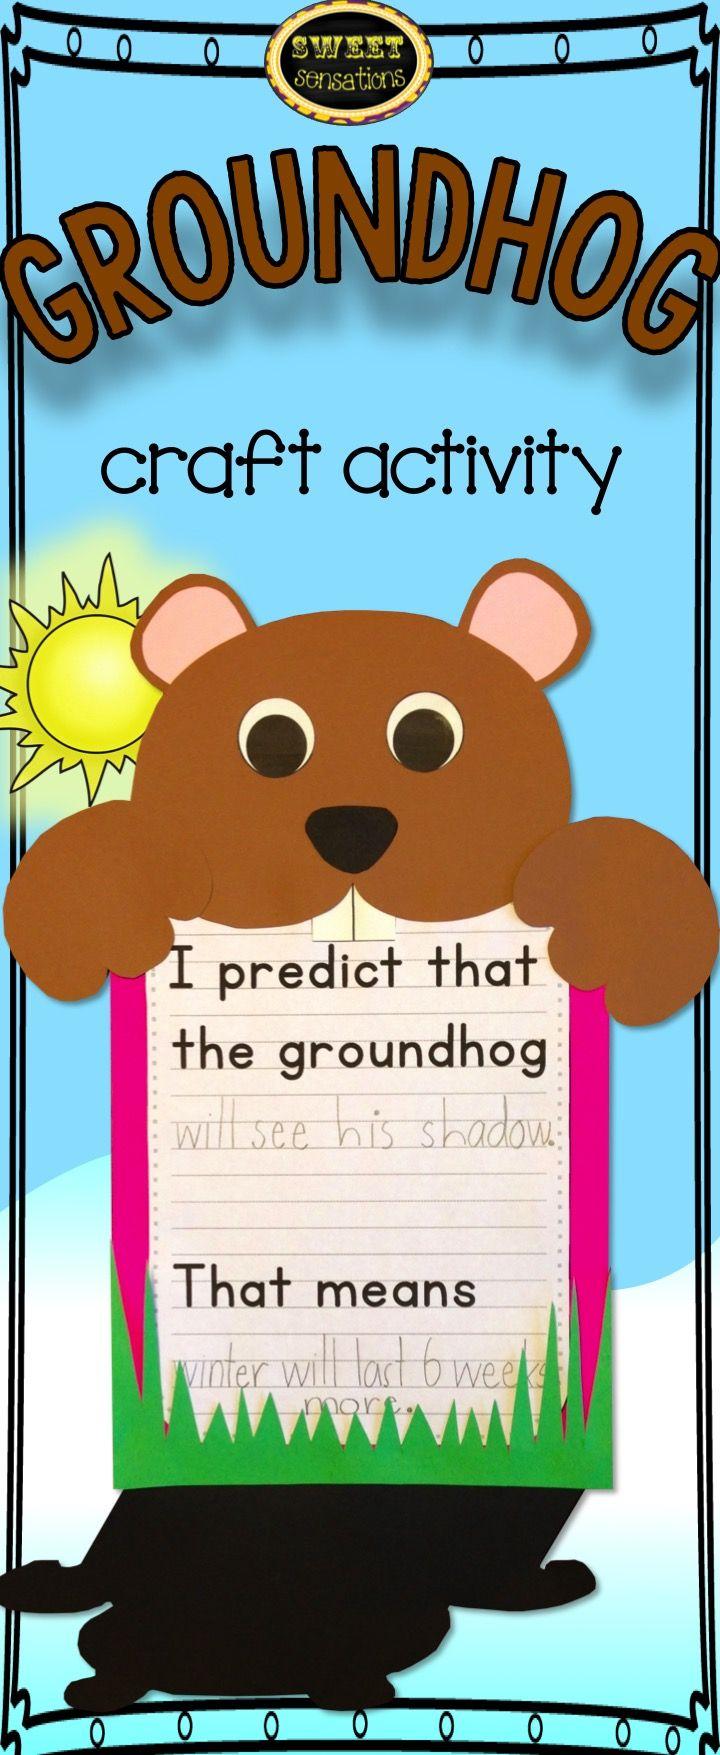 Groundhog Day Craft Groundhog Day Prediction Writing Activity Groundhog Day Activities Ground Hog Day Crafts Groundhog Day [ 1755 x 720 Pixel ]